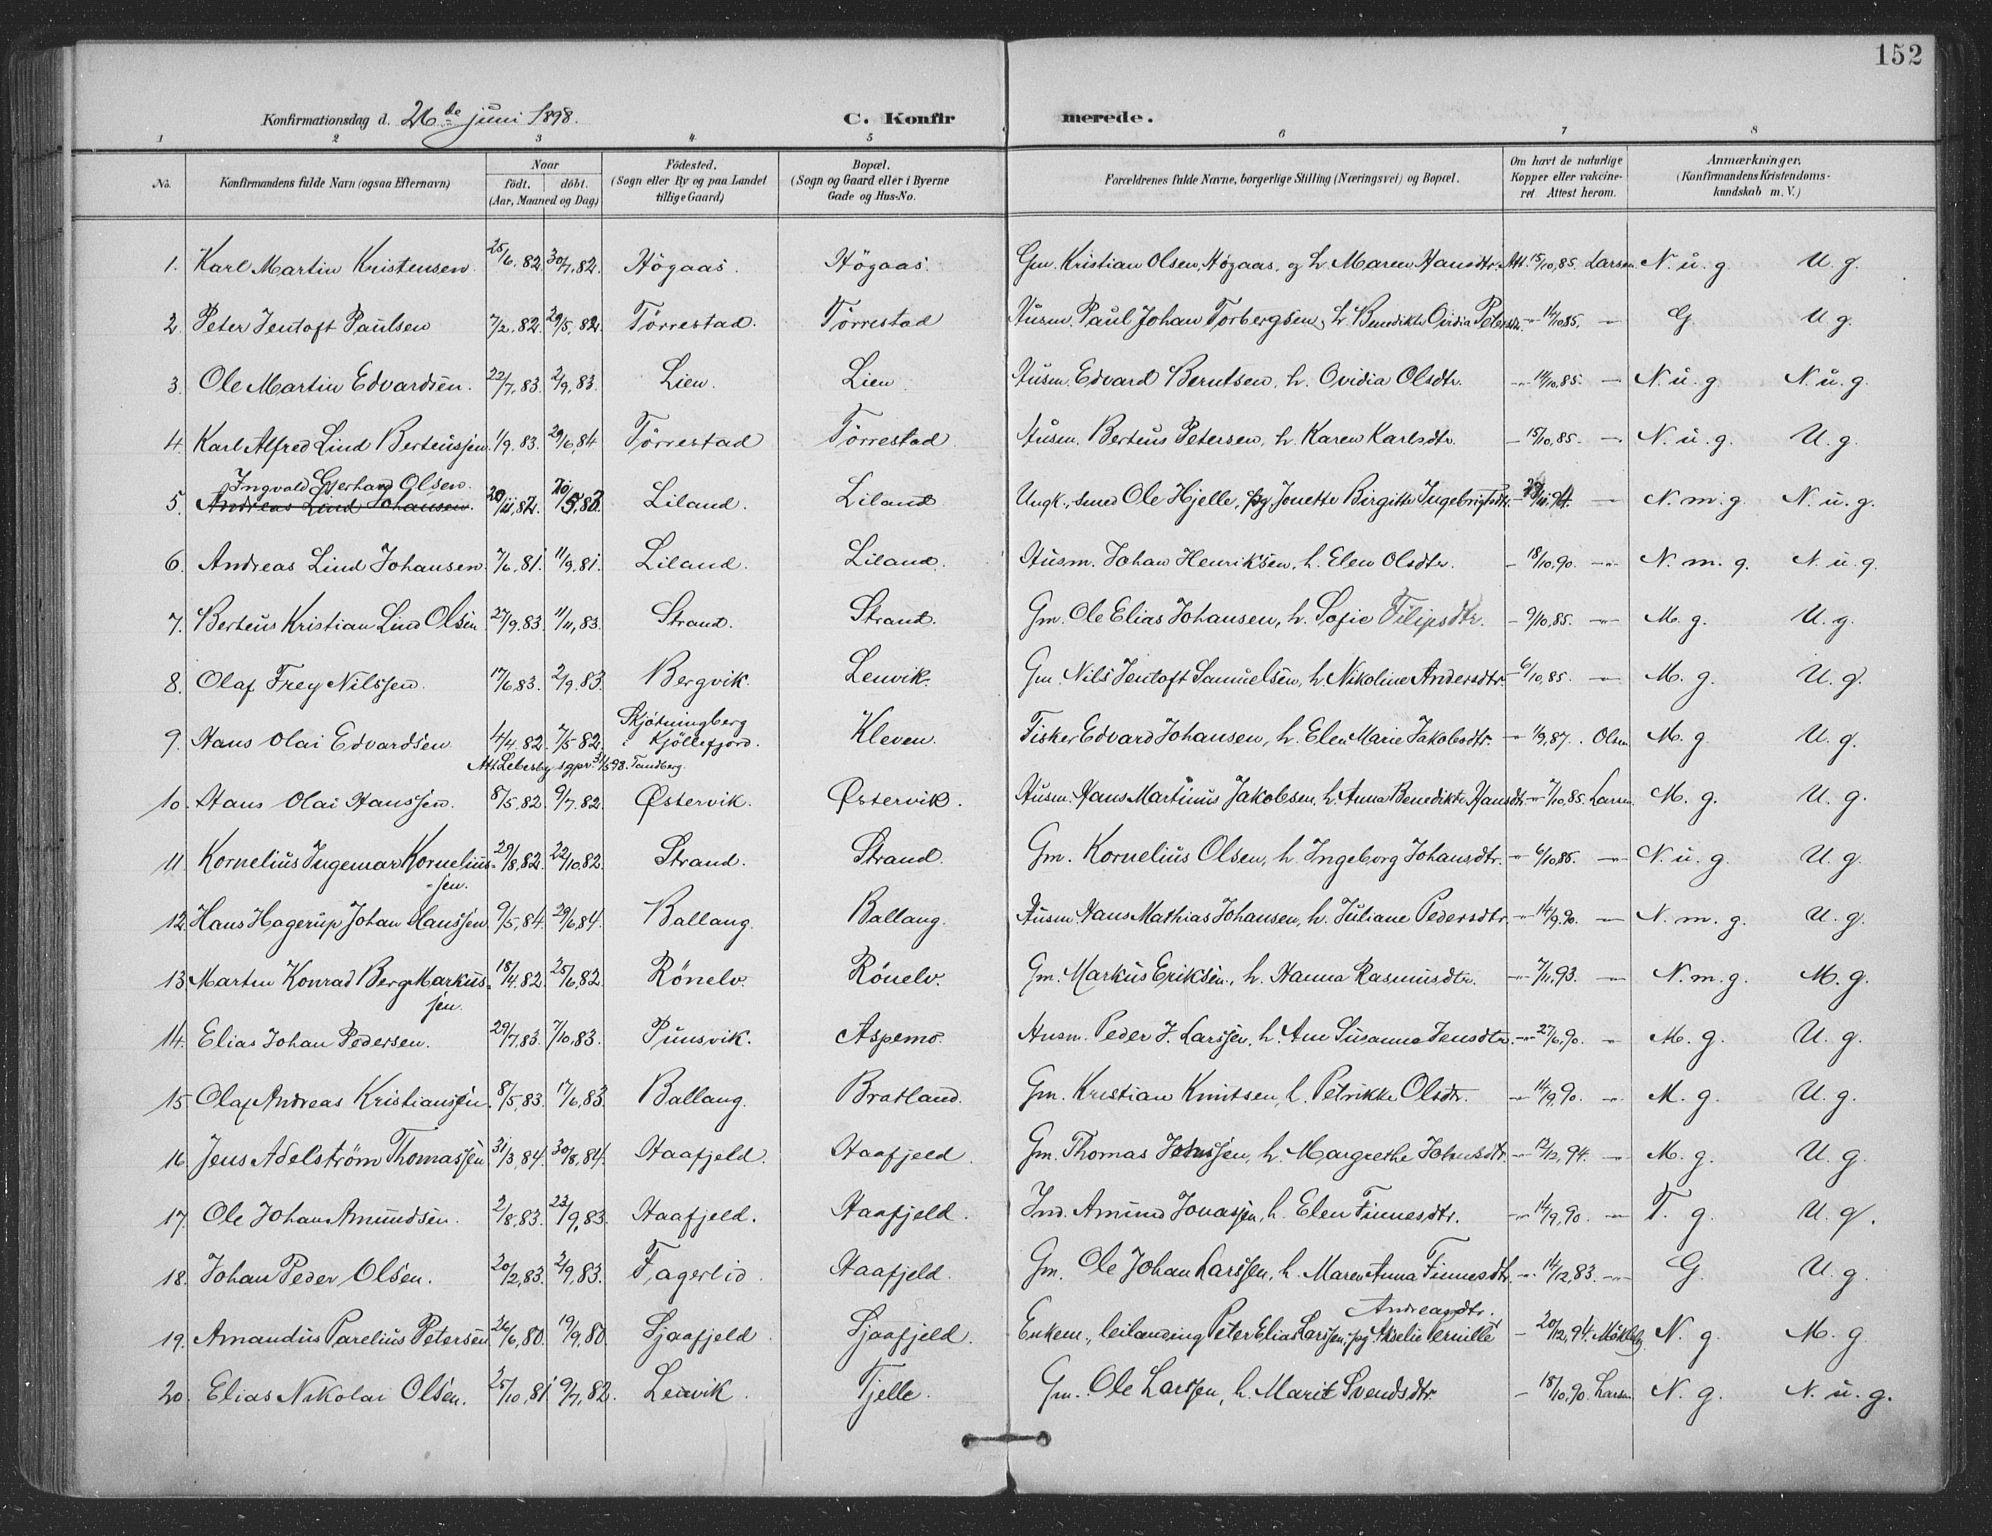 SAT, Ministerialprotokoller, klokkerbøker og fødselsregistre - Nordland, 863/L0899: Ministerialbok nr. 863A11, 1897-1906, s. 152